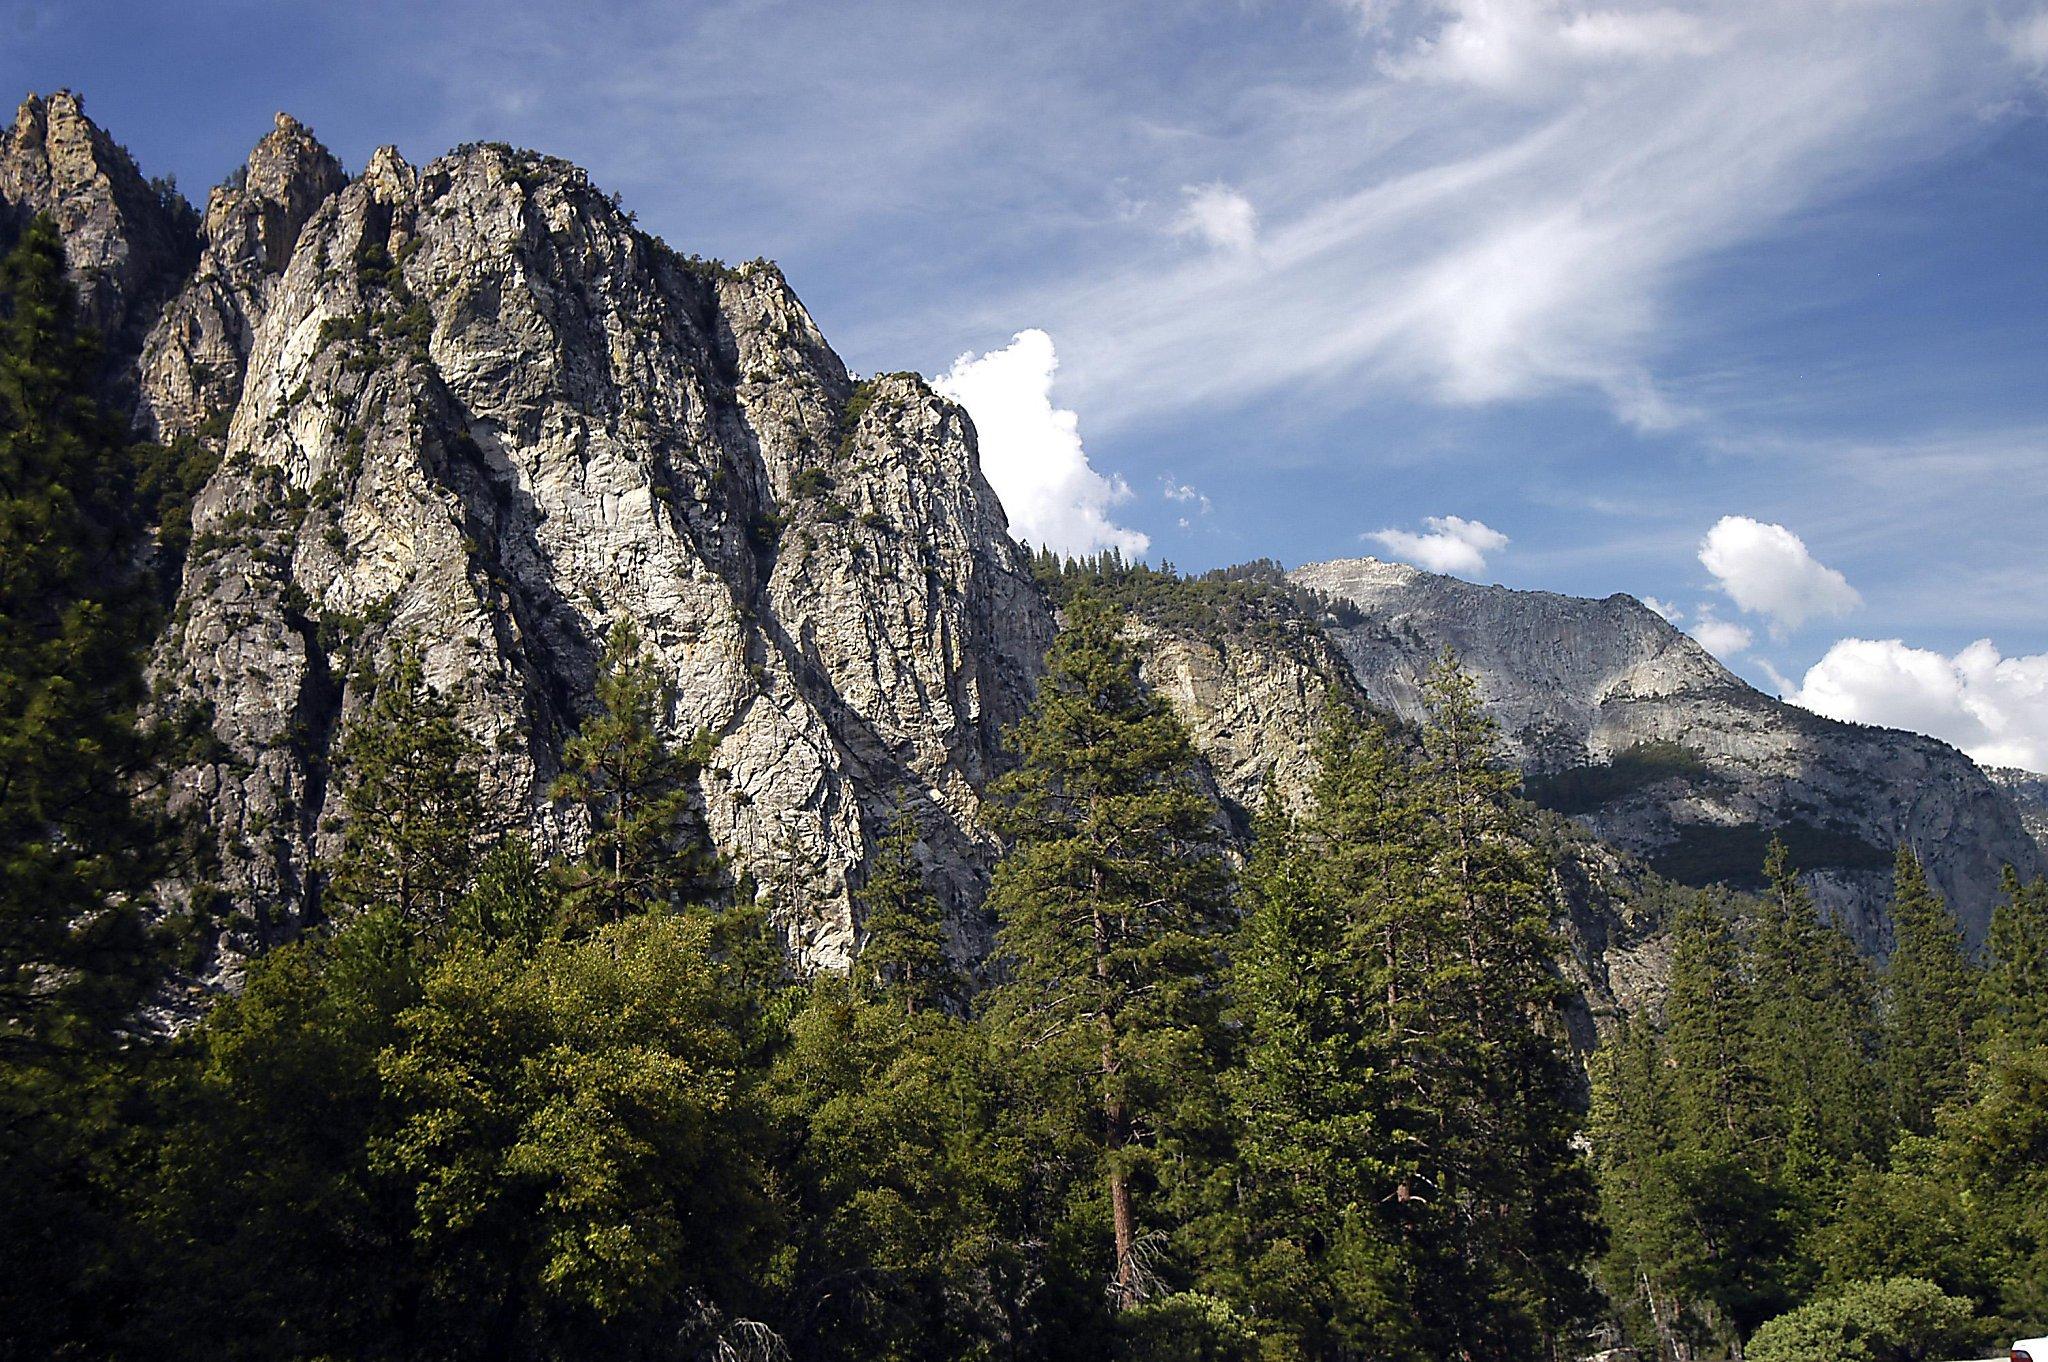 Rock climber falls 200 feet to his death on John Muir Trail